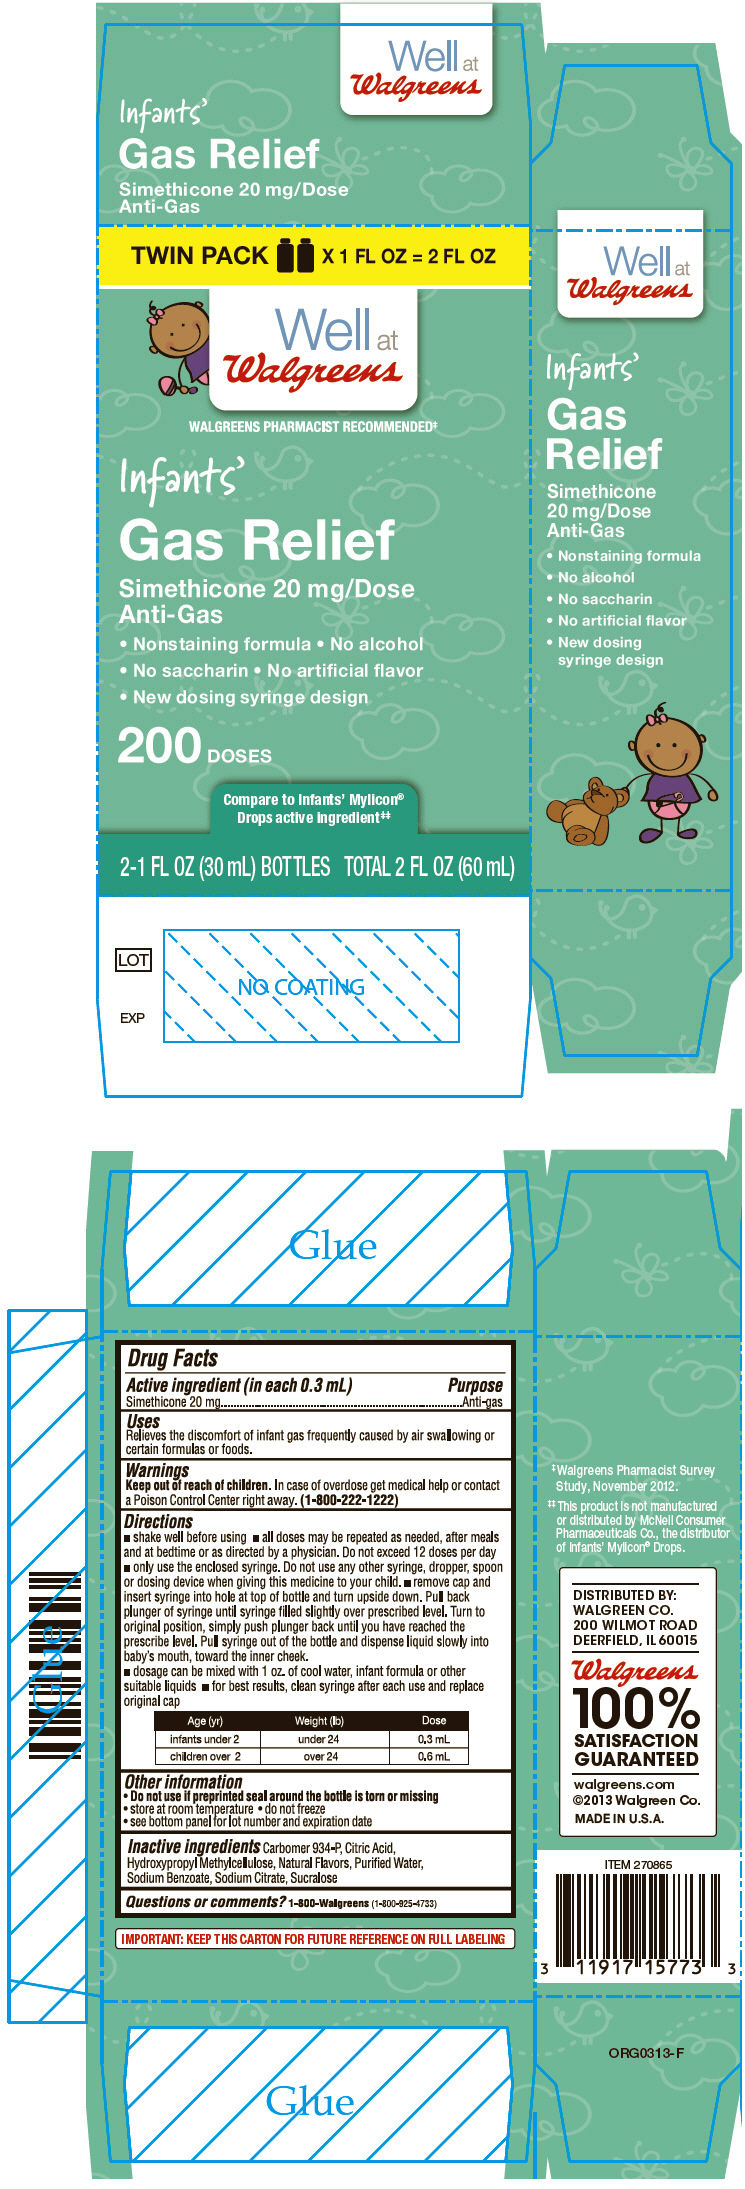 Infants Gas Relief Non-staining Formula (Dimethicone) Liquid [Walgreens]